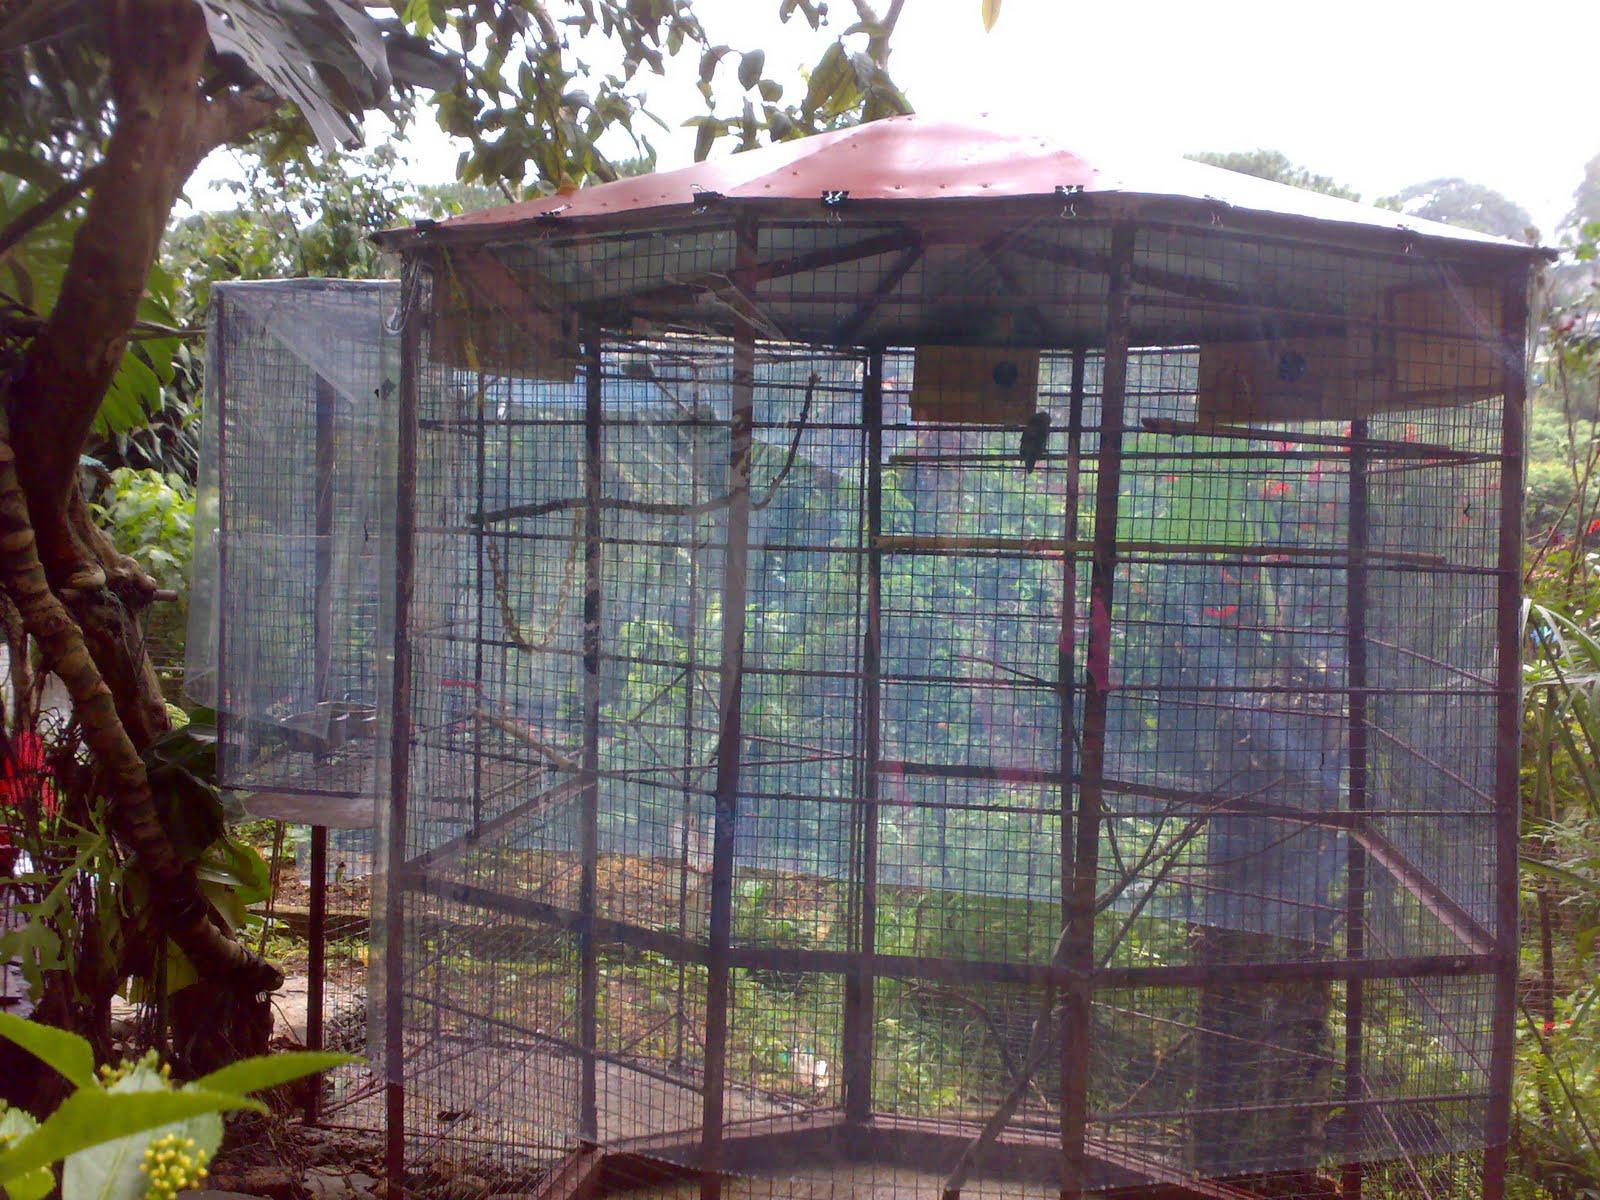 Making The Outdoor Aviary: The Lovebirds Inside the Aviary